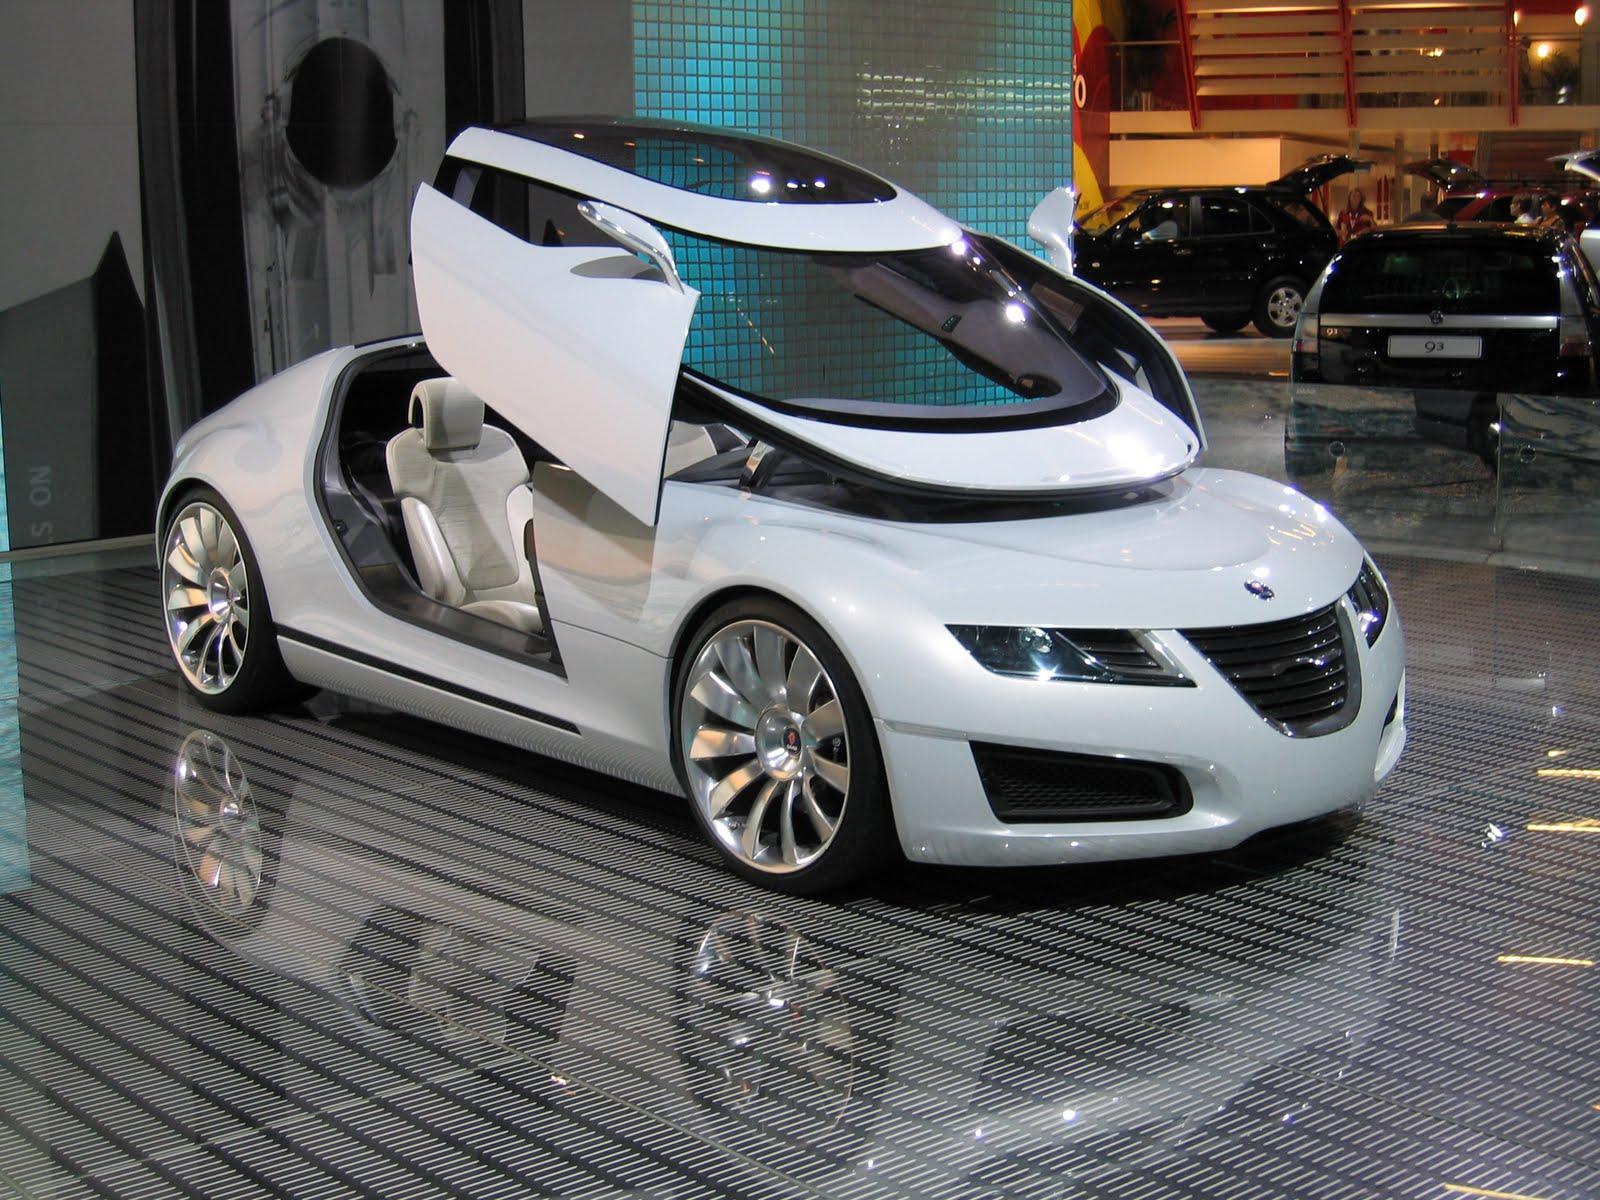 Amazing Cars Auto Car